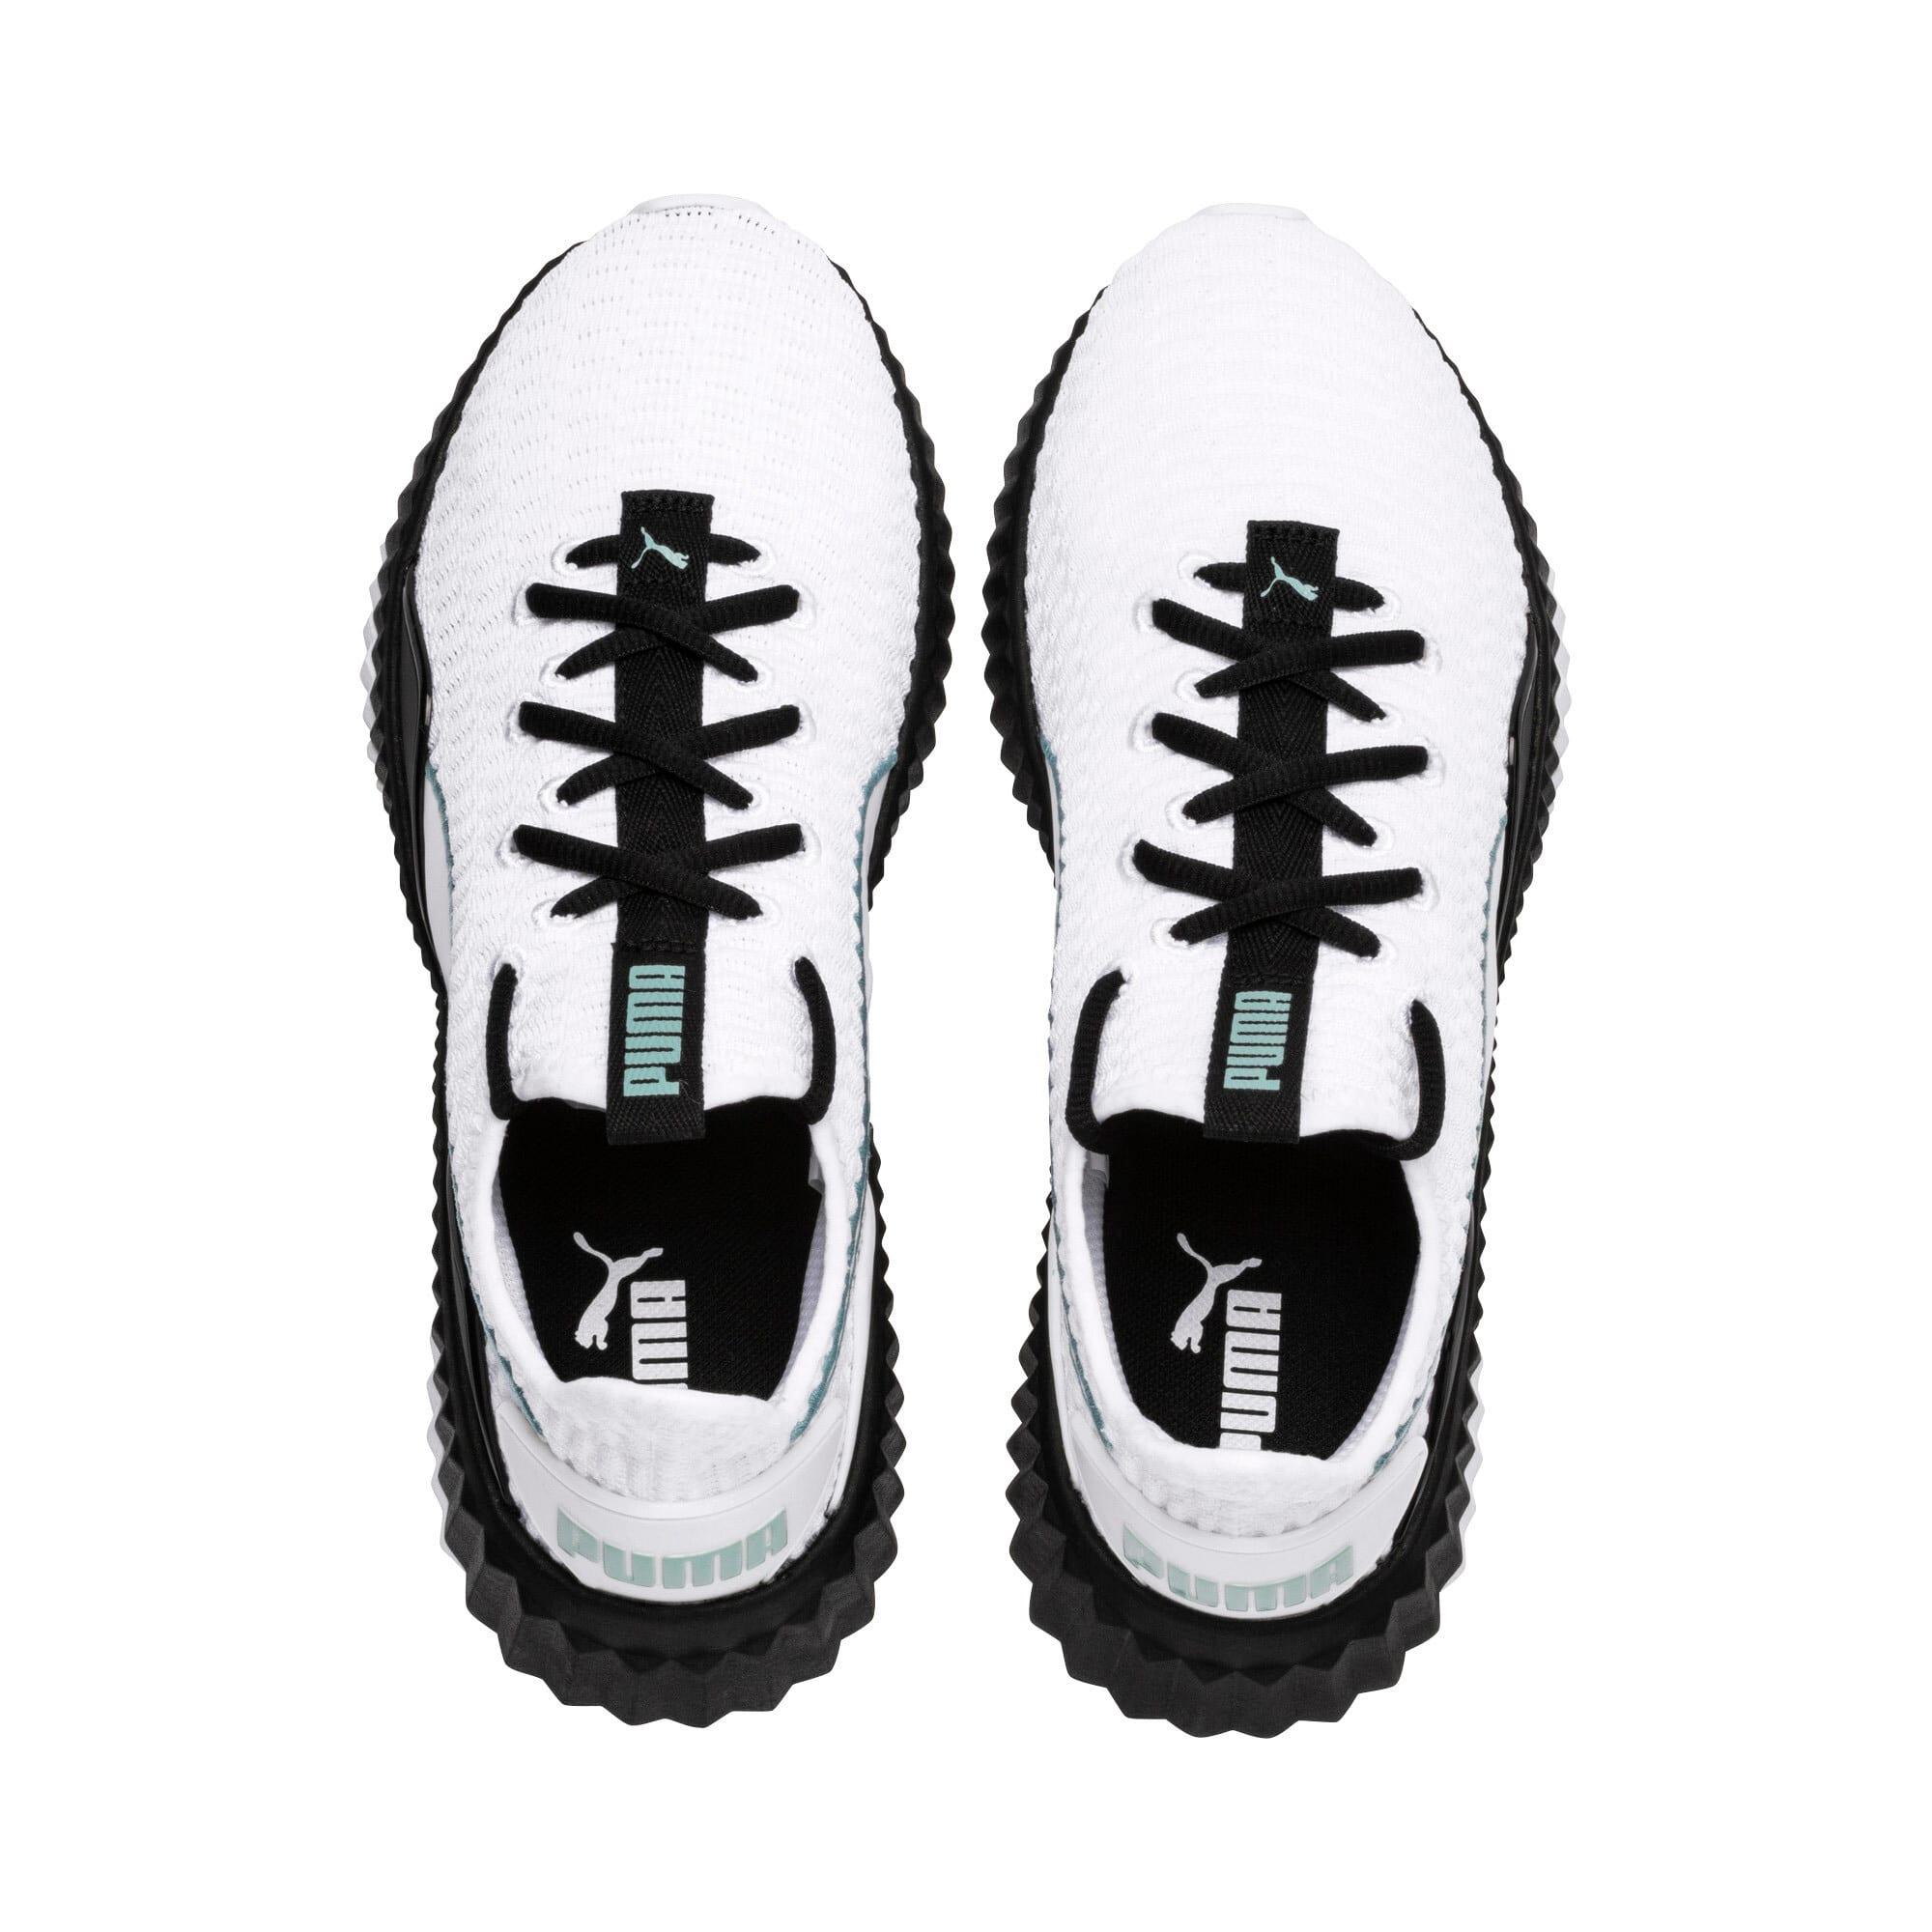 Thumbnail 7 of Defy Damen Sneaker, Puma White-Puma Black, medium